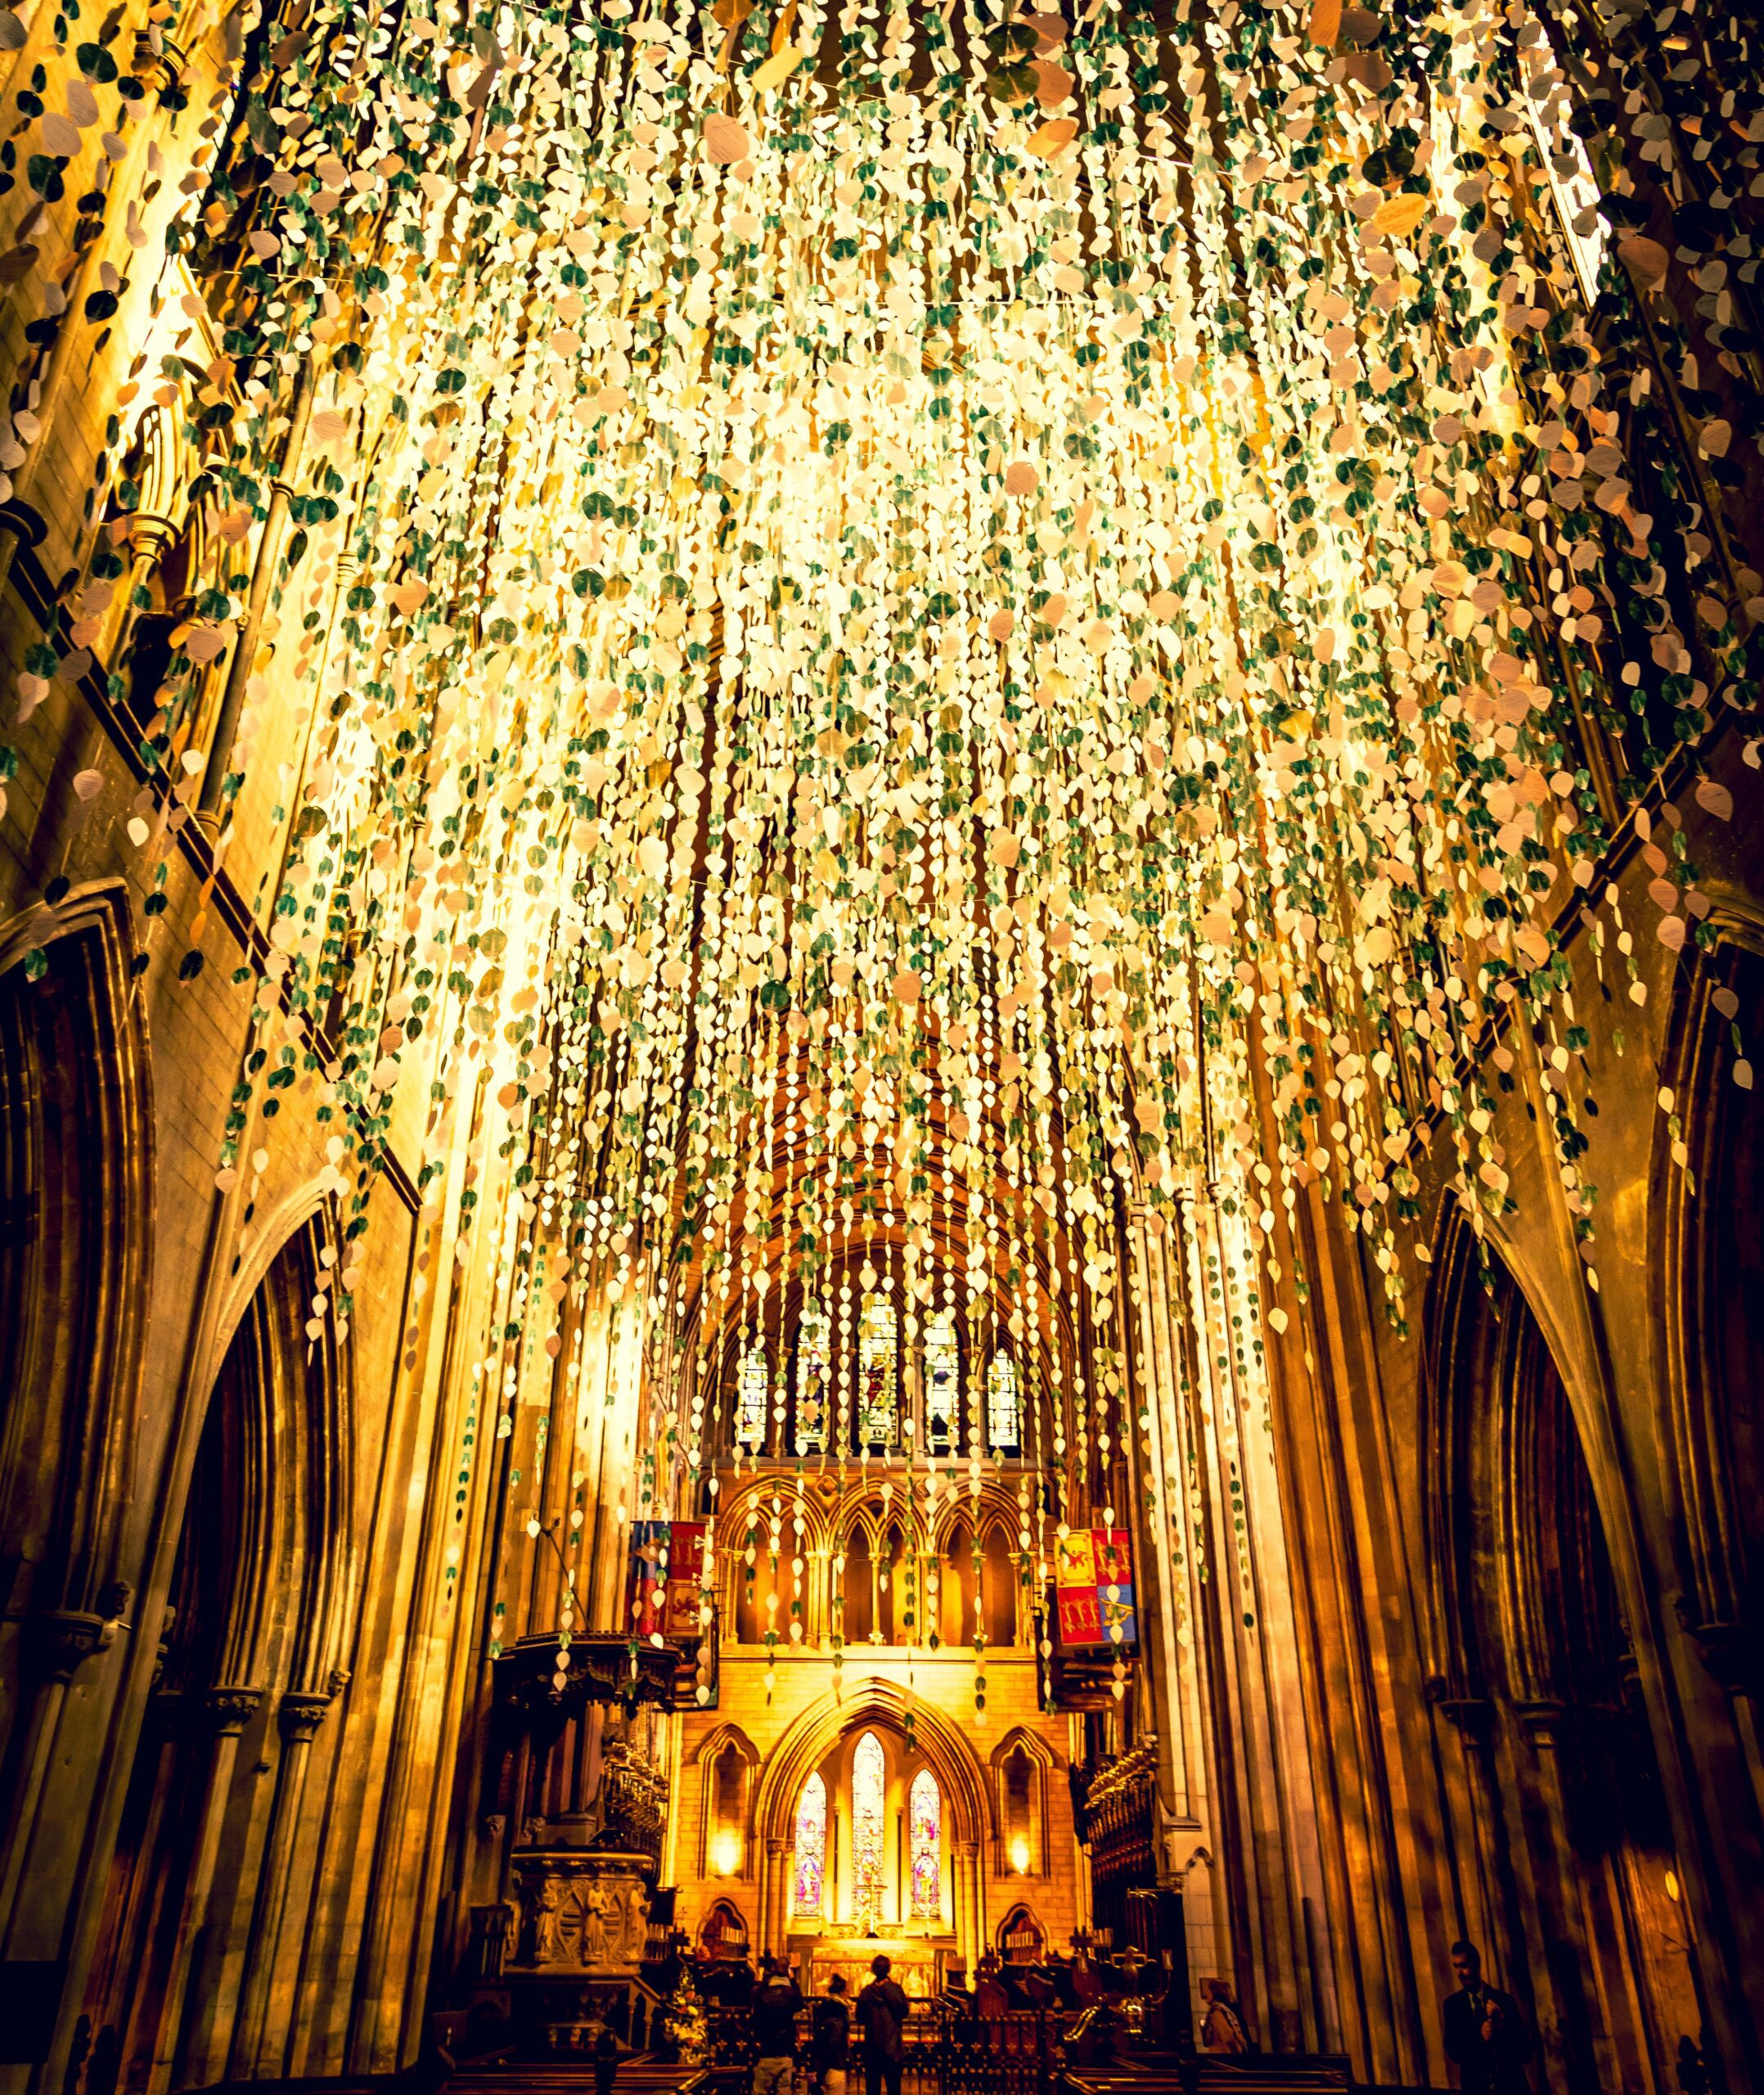 jaime-casap-Interior of Dublin Church during Holidays decorated-unsplash